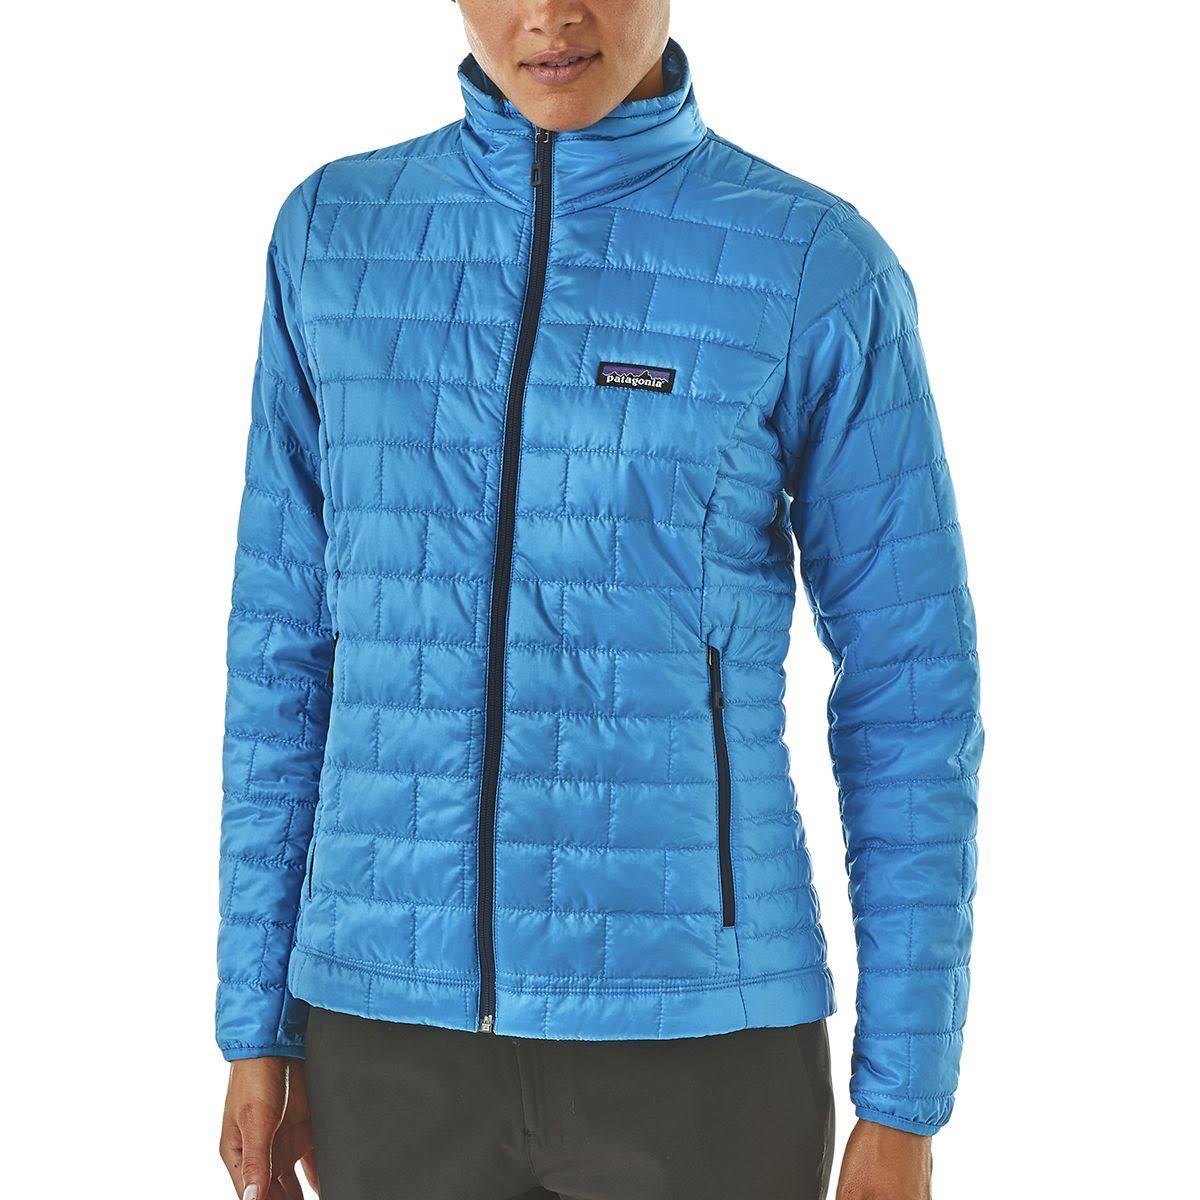 Patagonia Für Puff Damen Jacket Nano L 84217 Lapiz Blue fTqT6a